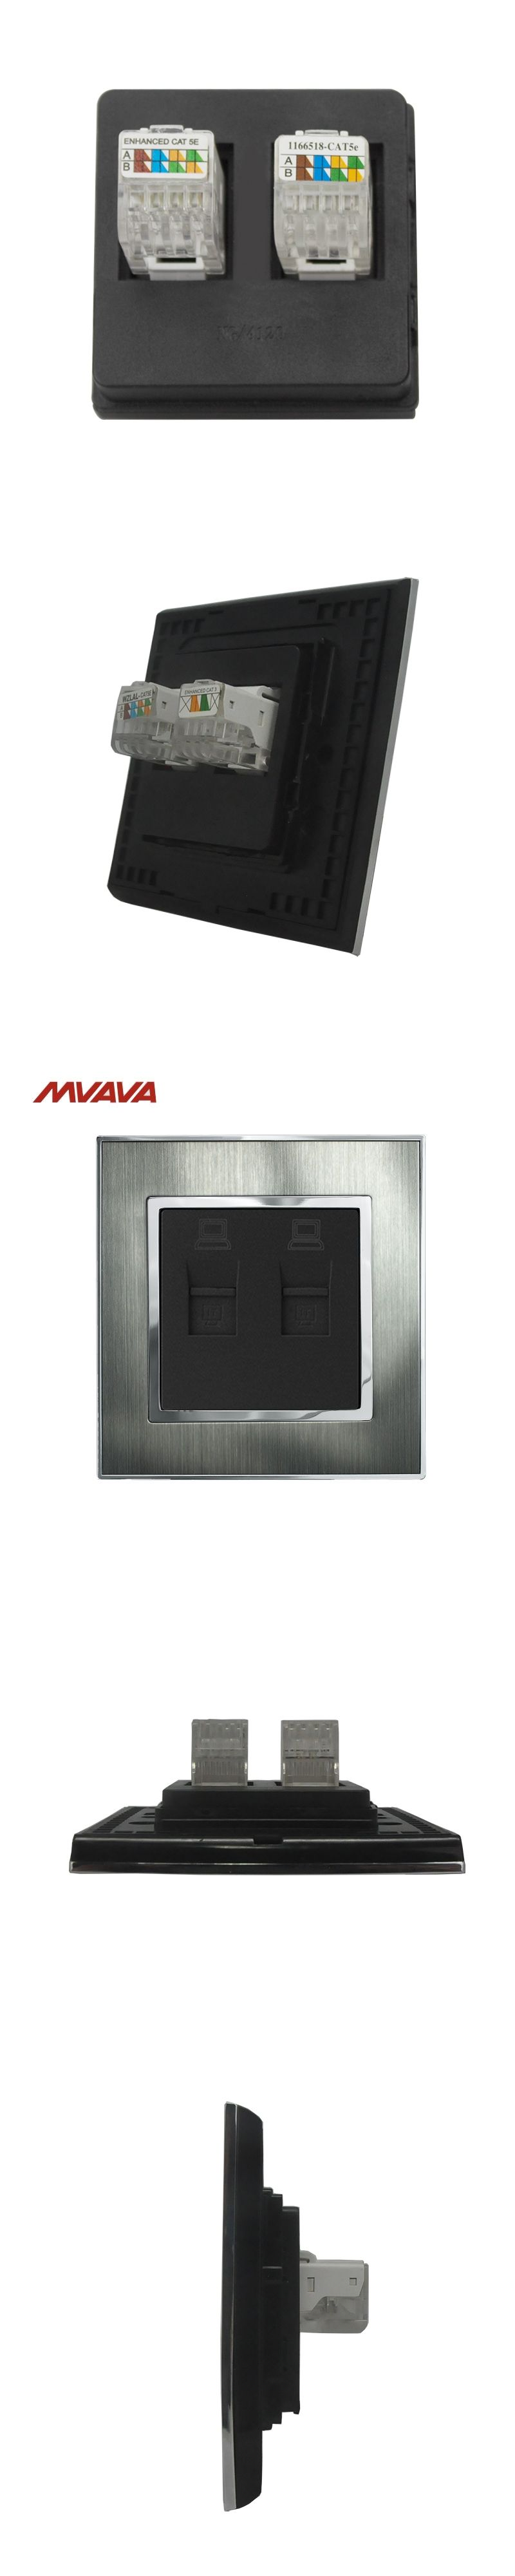 MVAVA Dual RJ45 Computer Jack Plug Port Wall Socket Double LAN ...